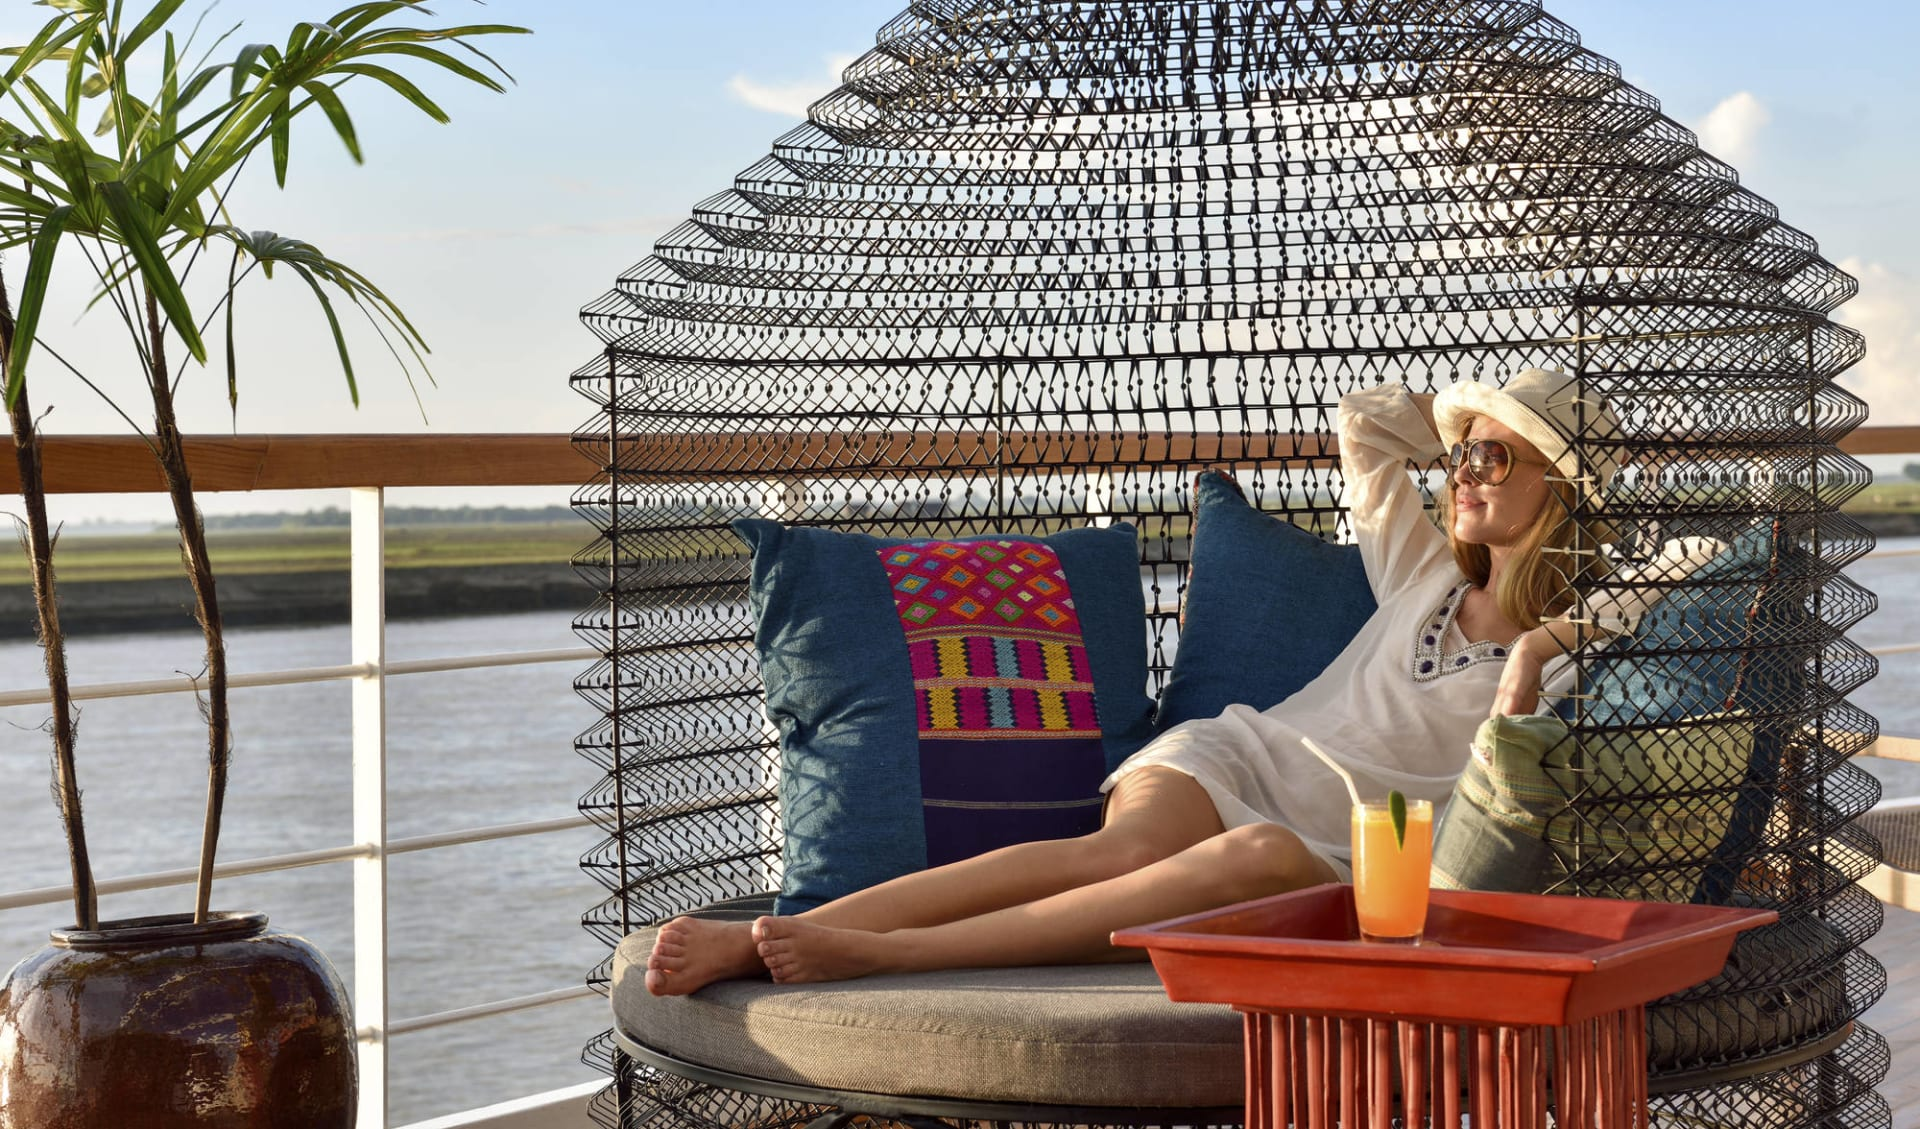 Flusskreuzfahrt auf der «Sanctuary Ananda» Mandalay-Bagan: Sanctuary Ananda Sundeck Sunset Cocktail